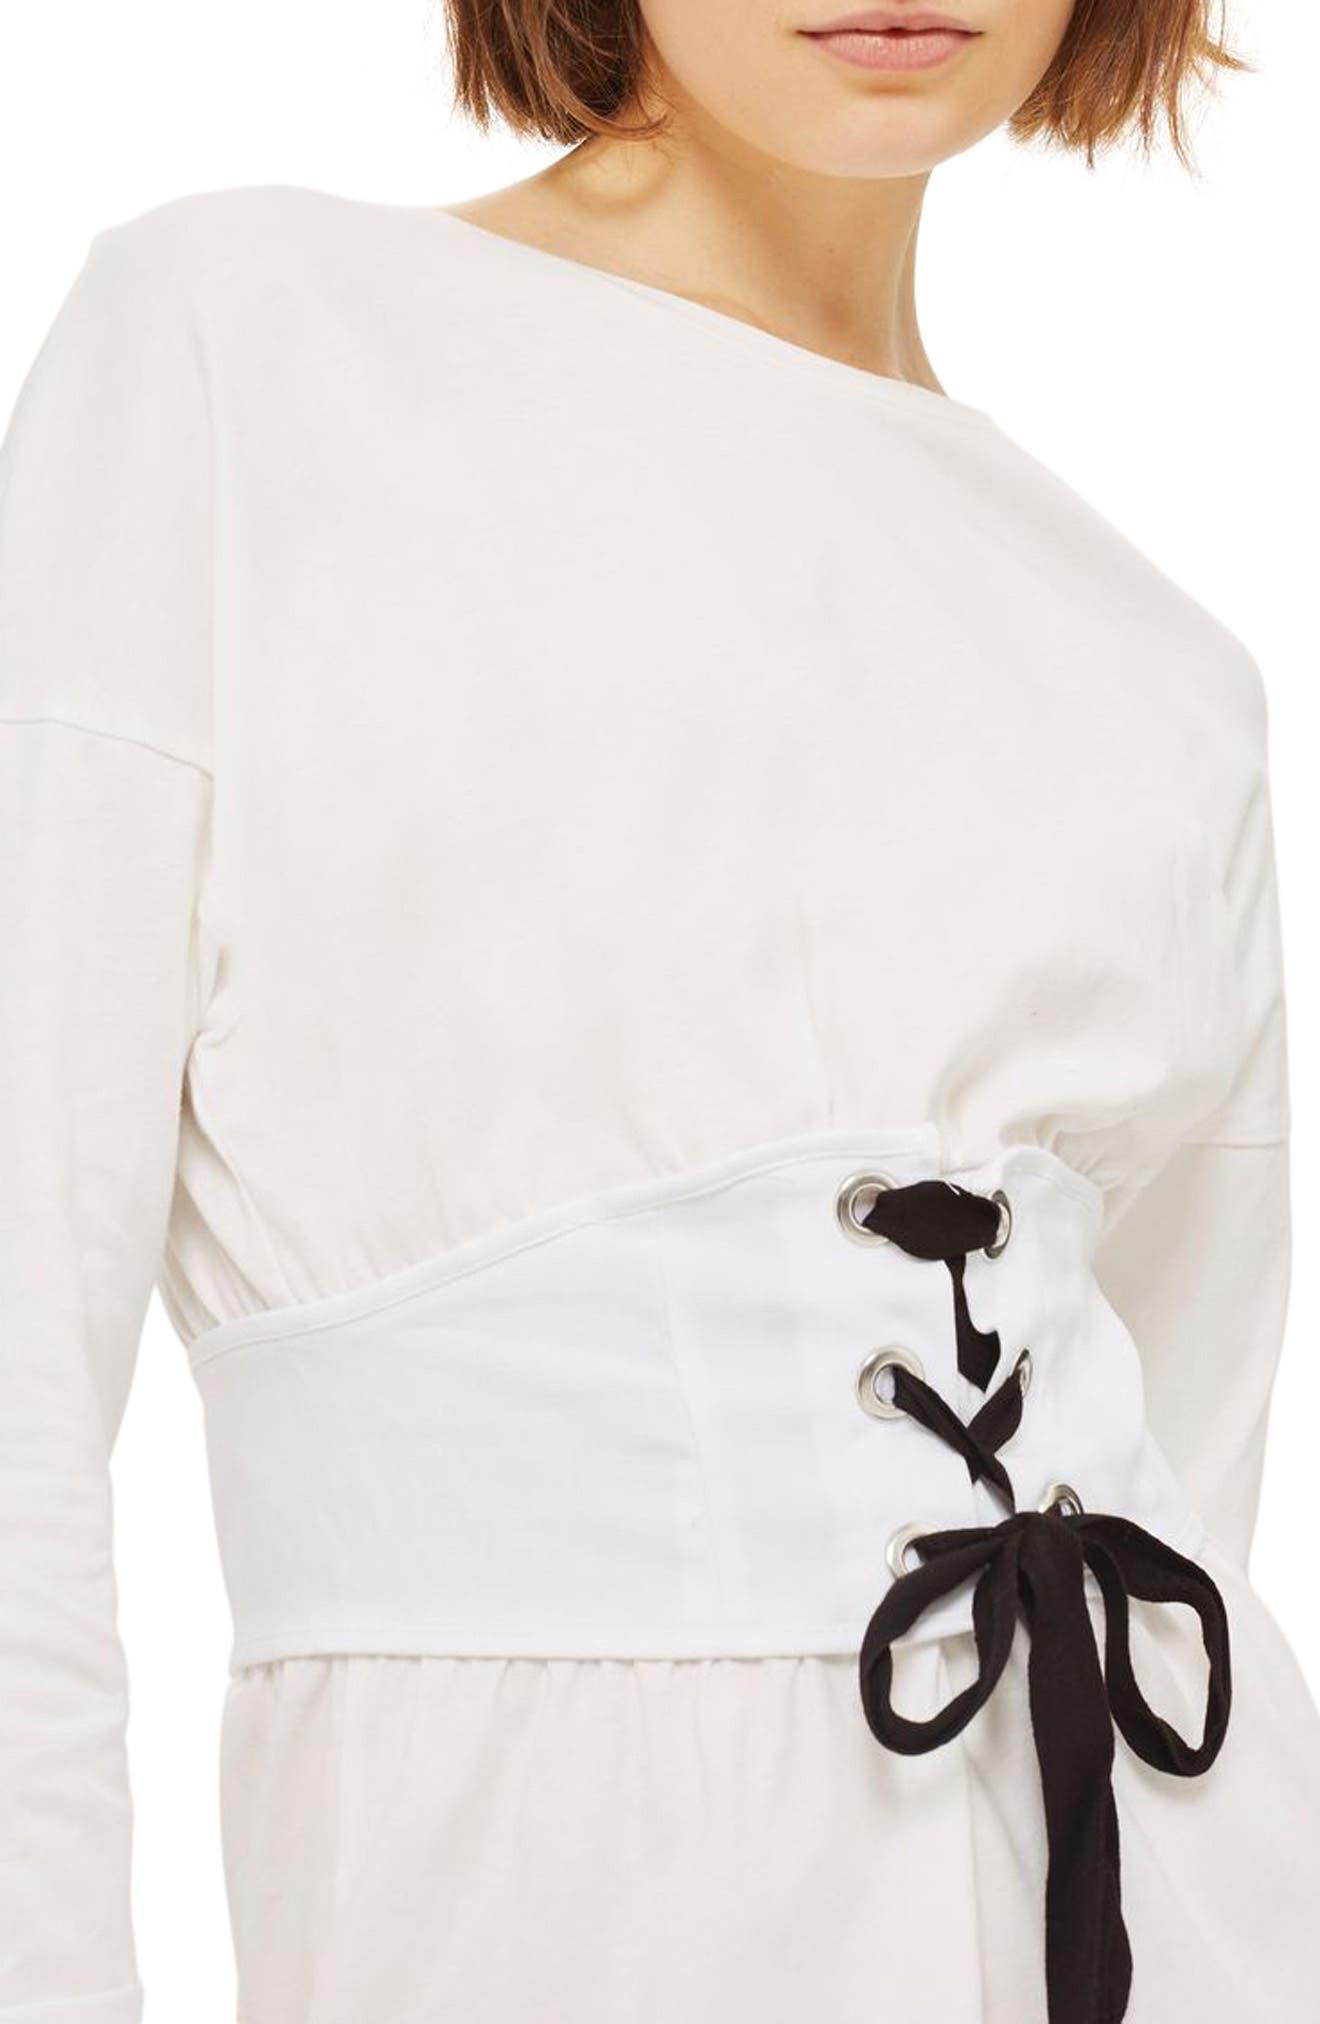 Alternate Image 3  - Topshop Corset T-Shirt Dress